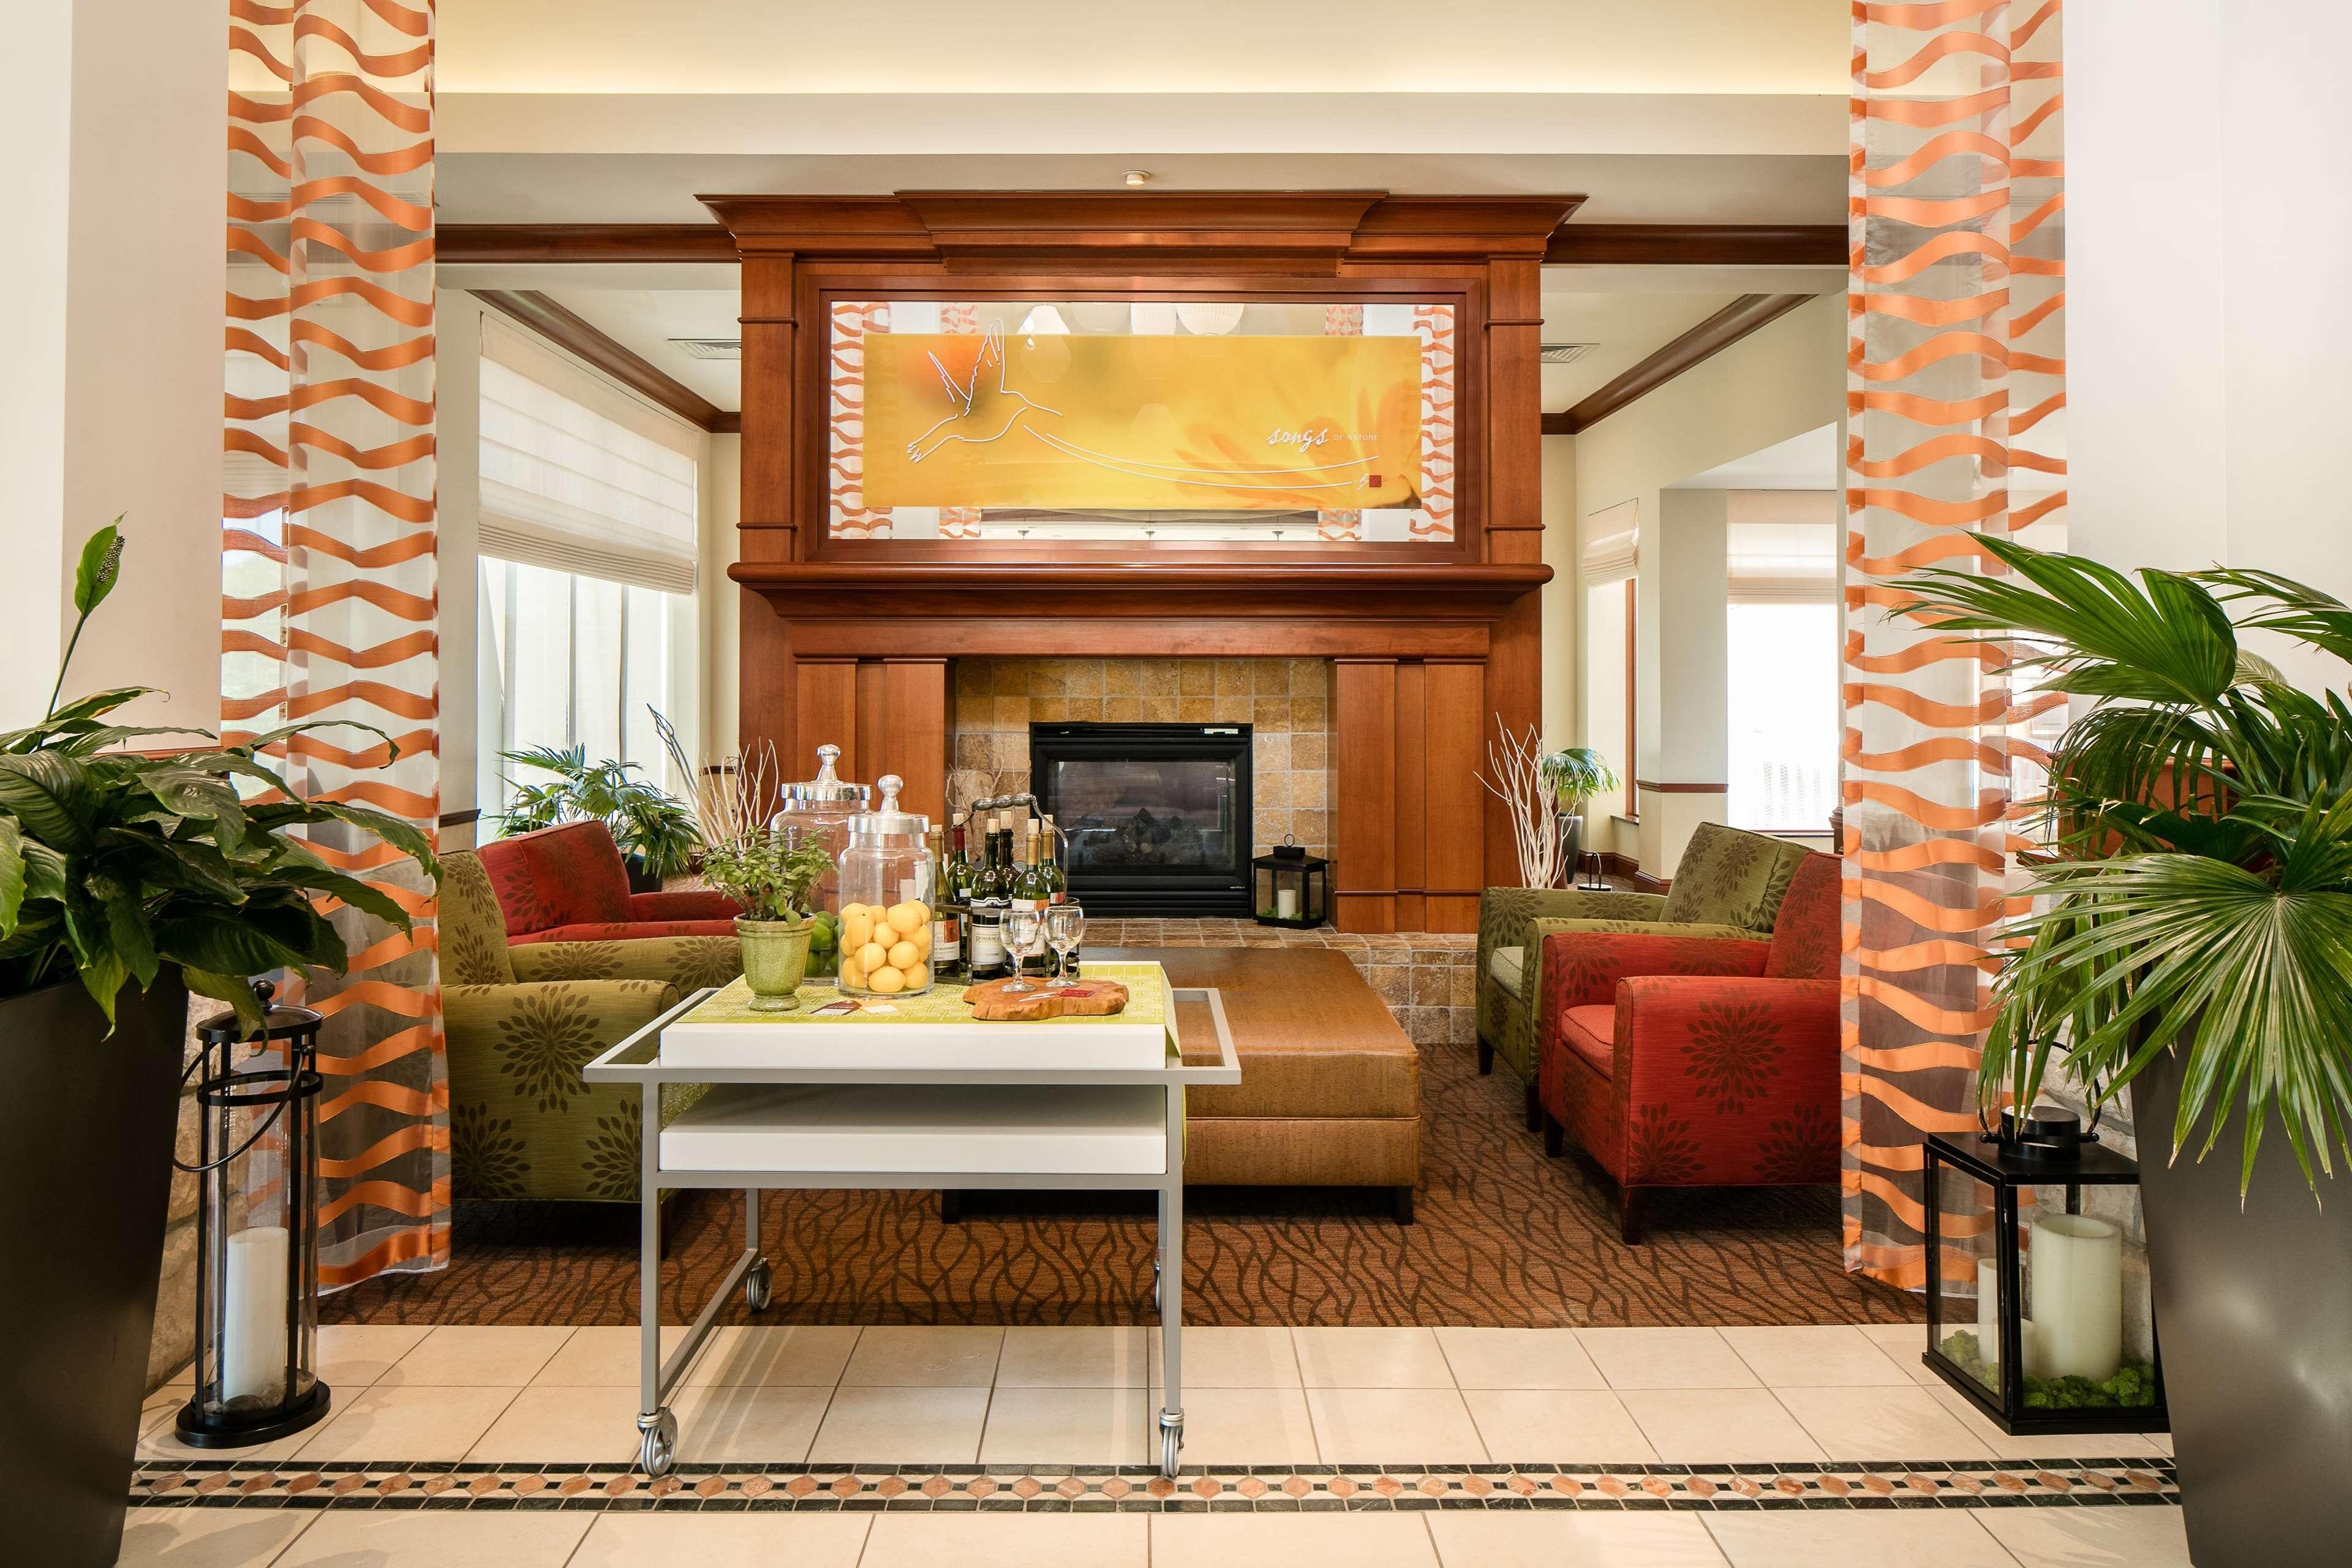 Hilton Garden Inn Omaha West 17879 Chicago Street Omaha, NE Hotels ...